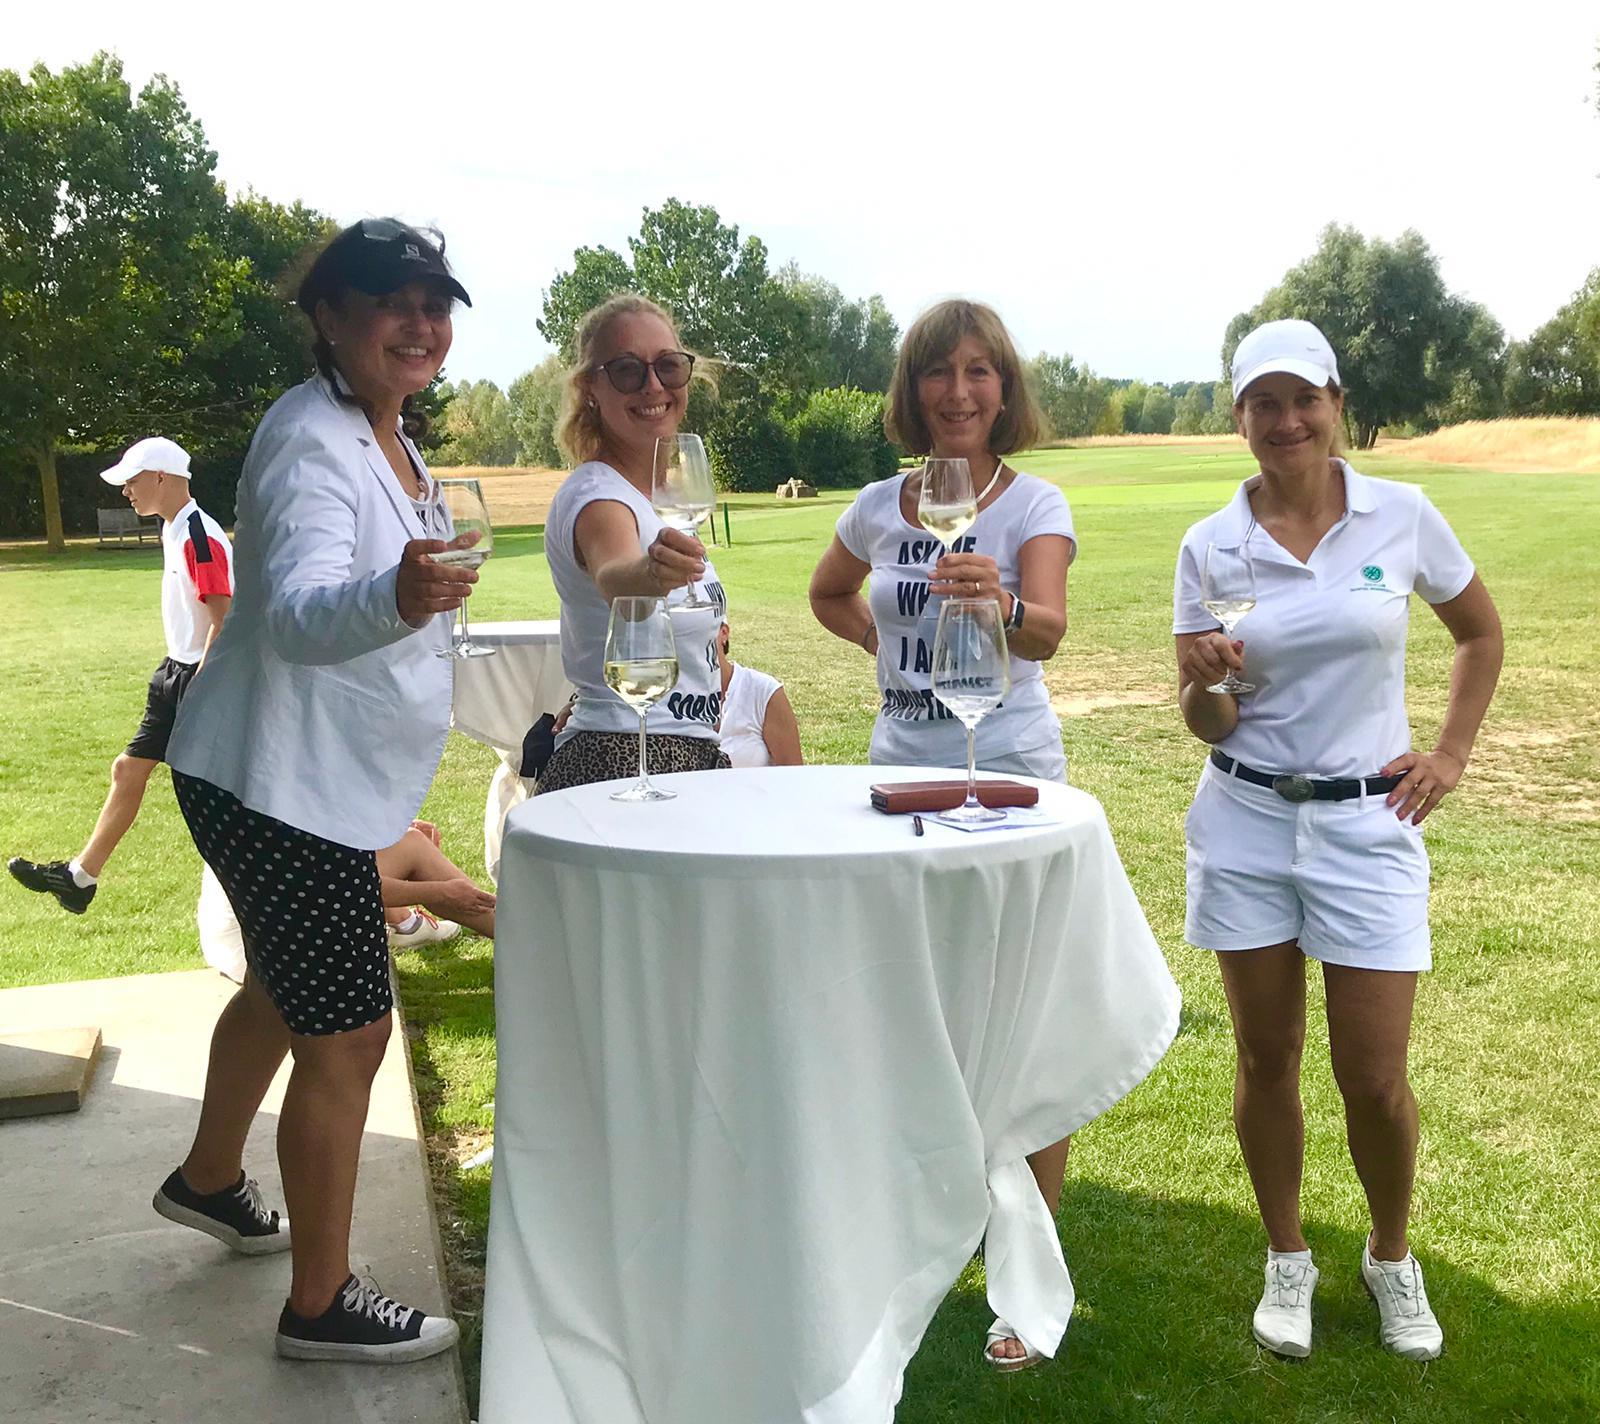 44_Golfturnier_Soroptimist_Golf_en_blanc